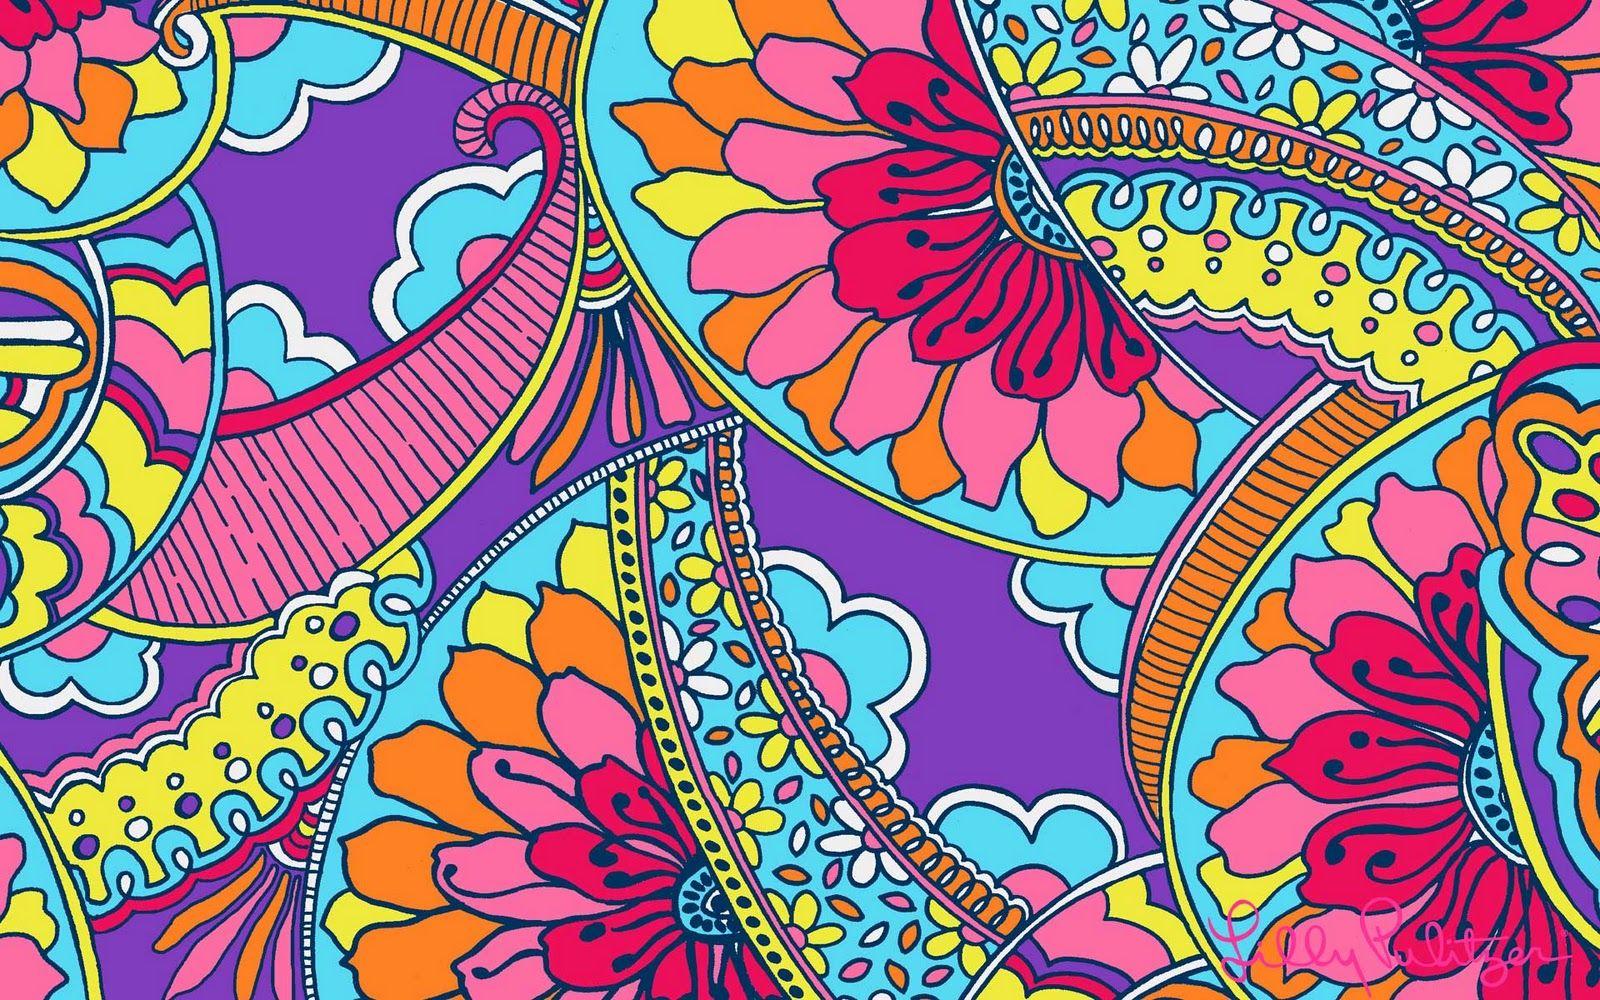 Popular Wallpaper Mac Artsy - 04ce27d8d9da2d8ebd56b5daa408aa8c  Gallery_852097.jpg